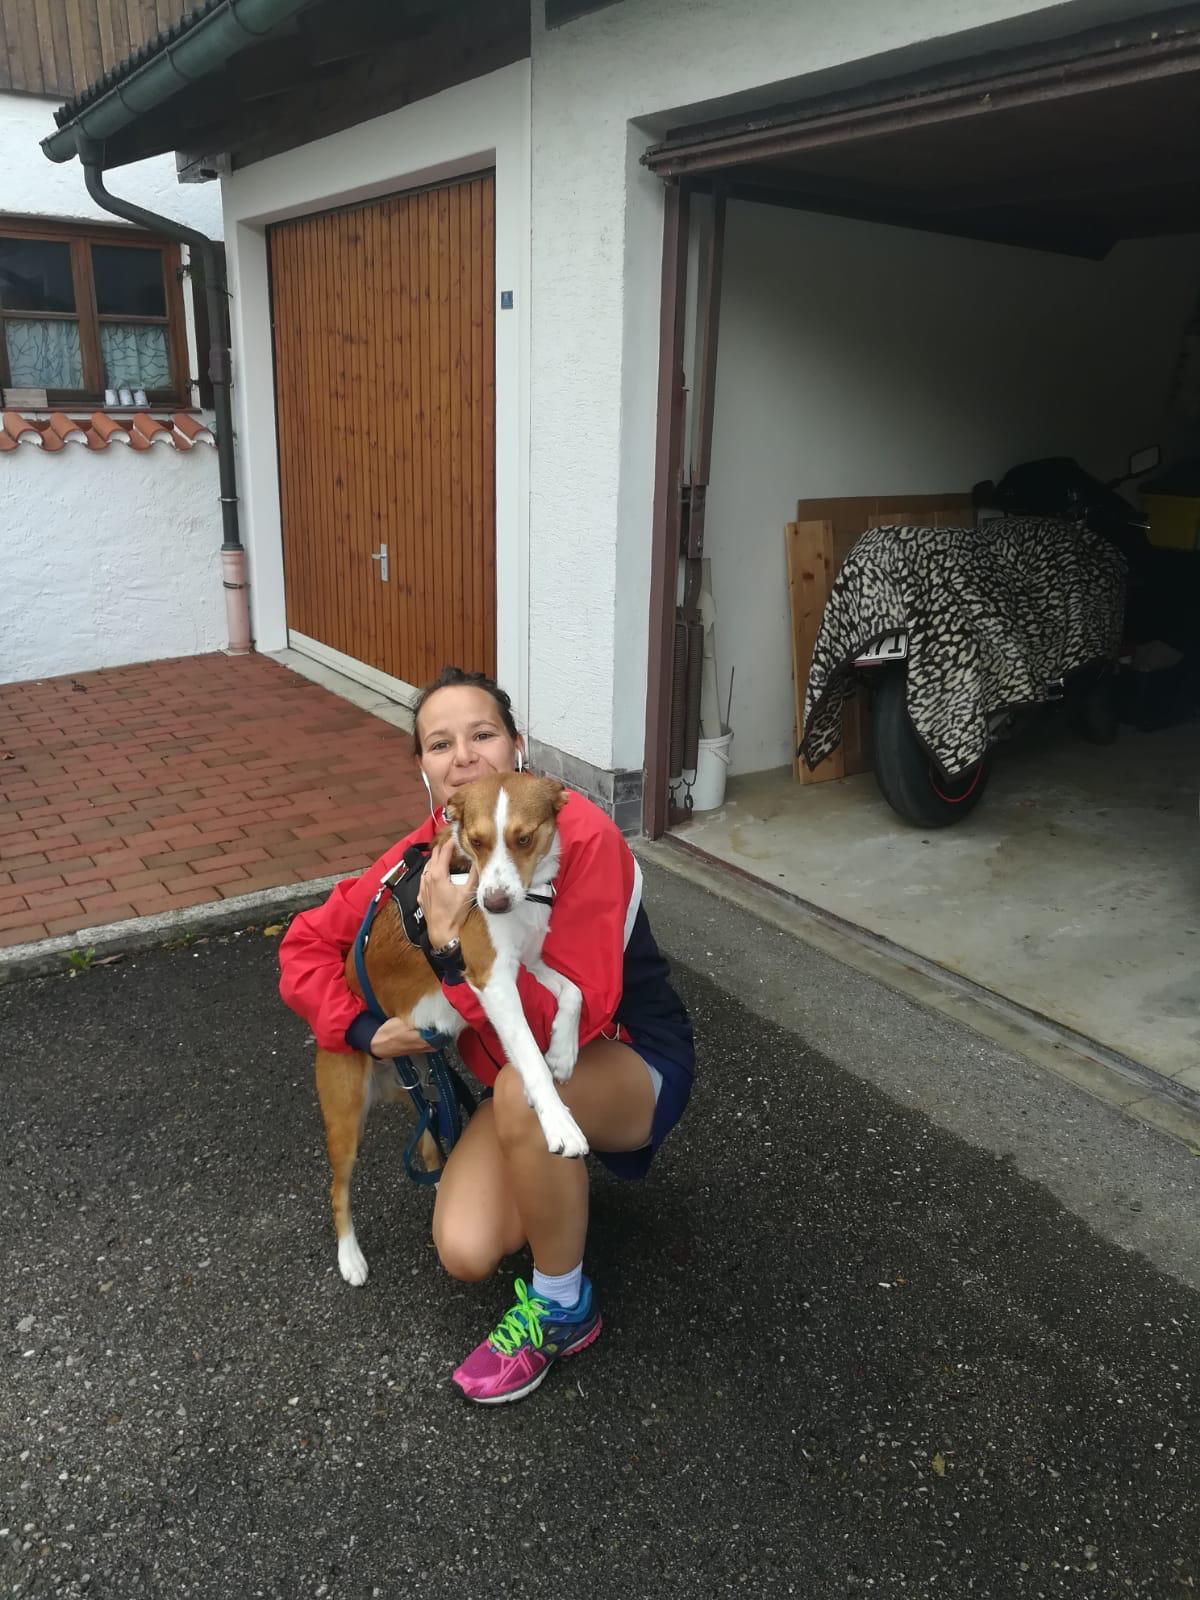 KiKu still goes olympia - Laufen